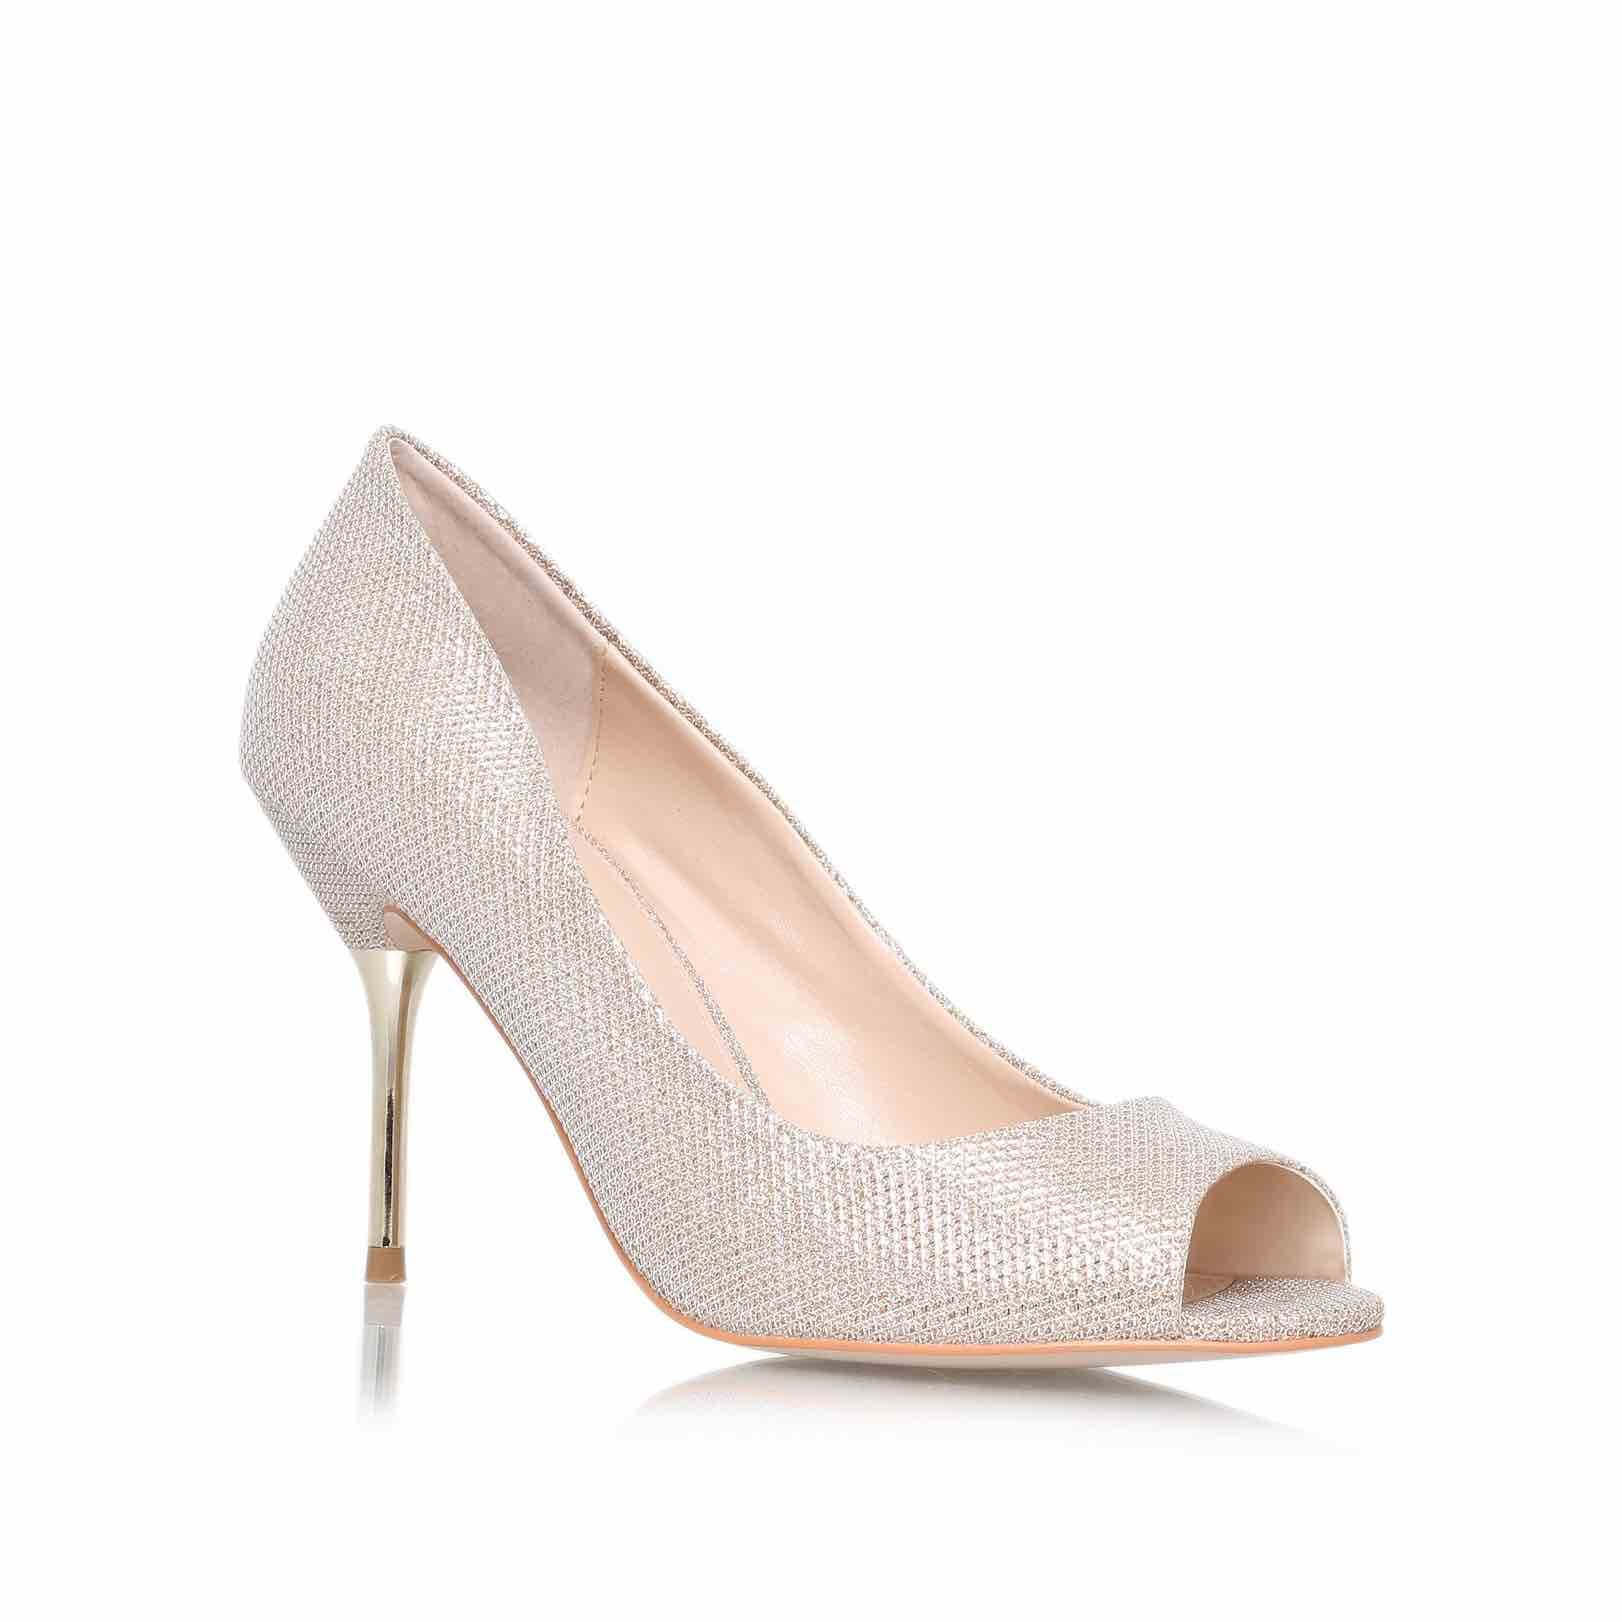 top 12 wedding shoes for under betsey johnson wedding shoes Metallic Geradine Shoe